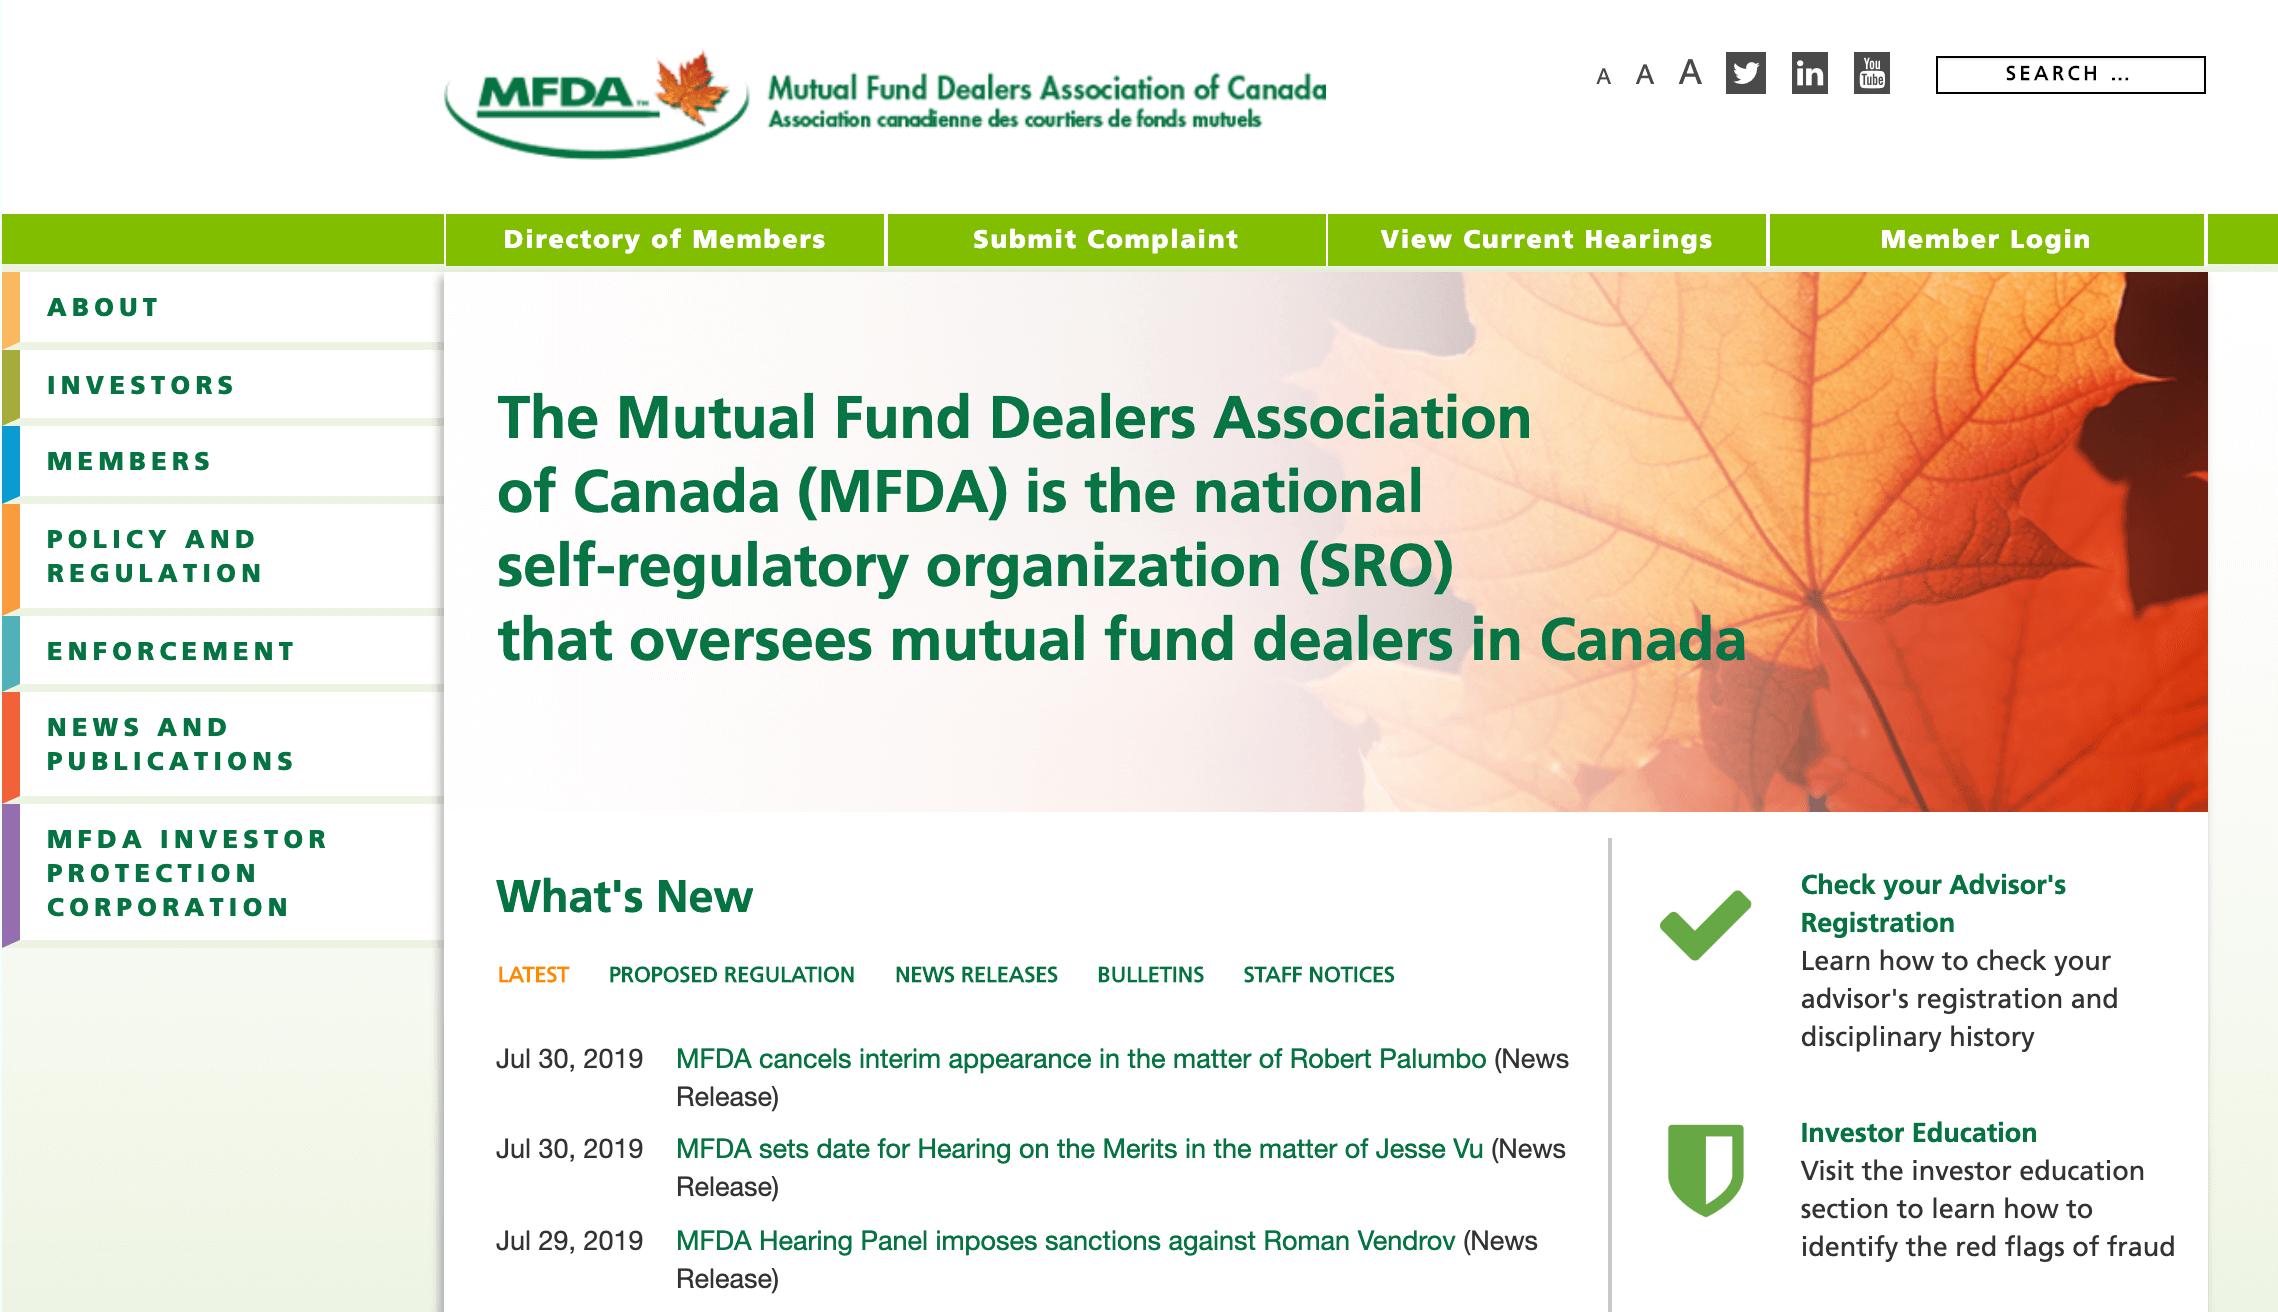 MFDA Website Design by C(Group